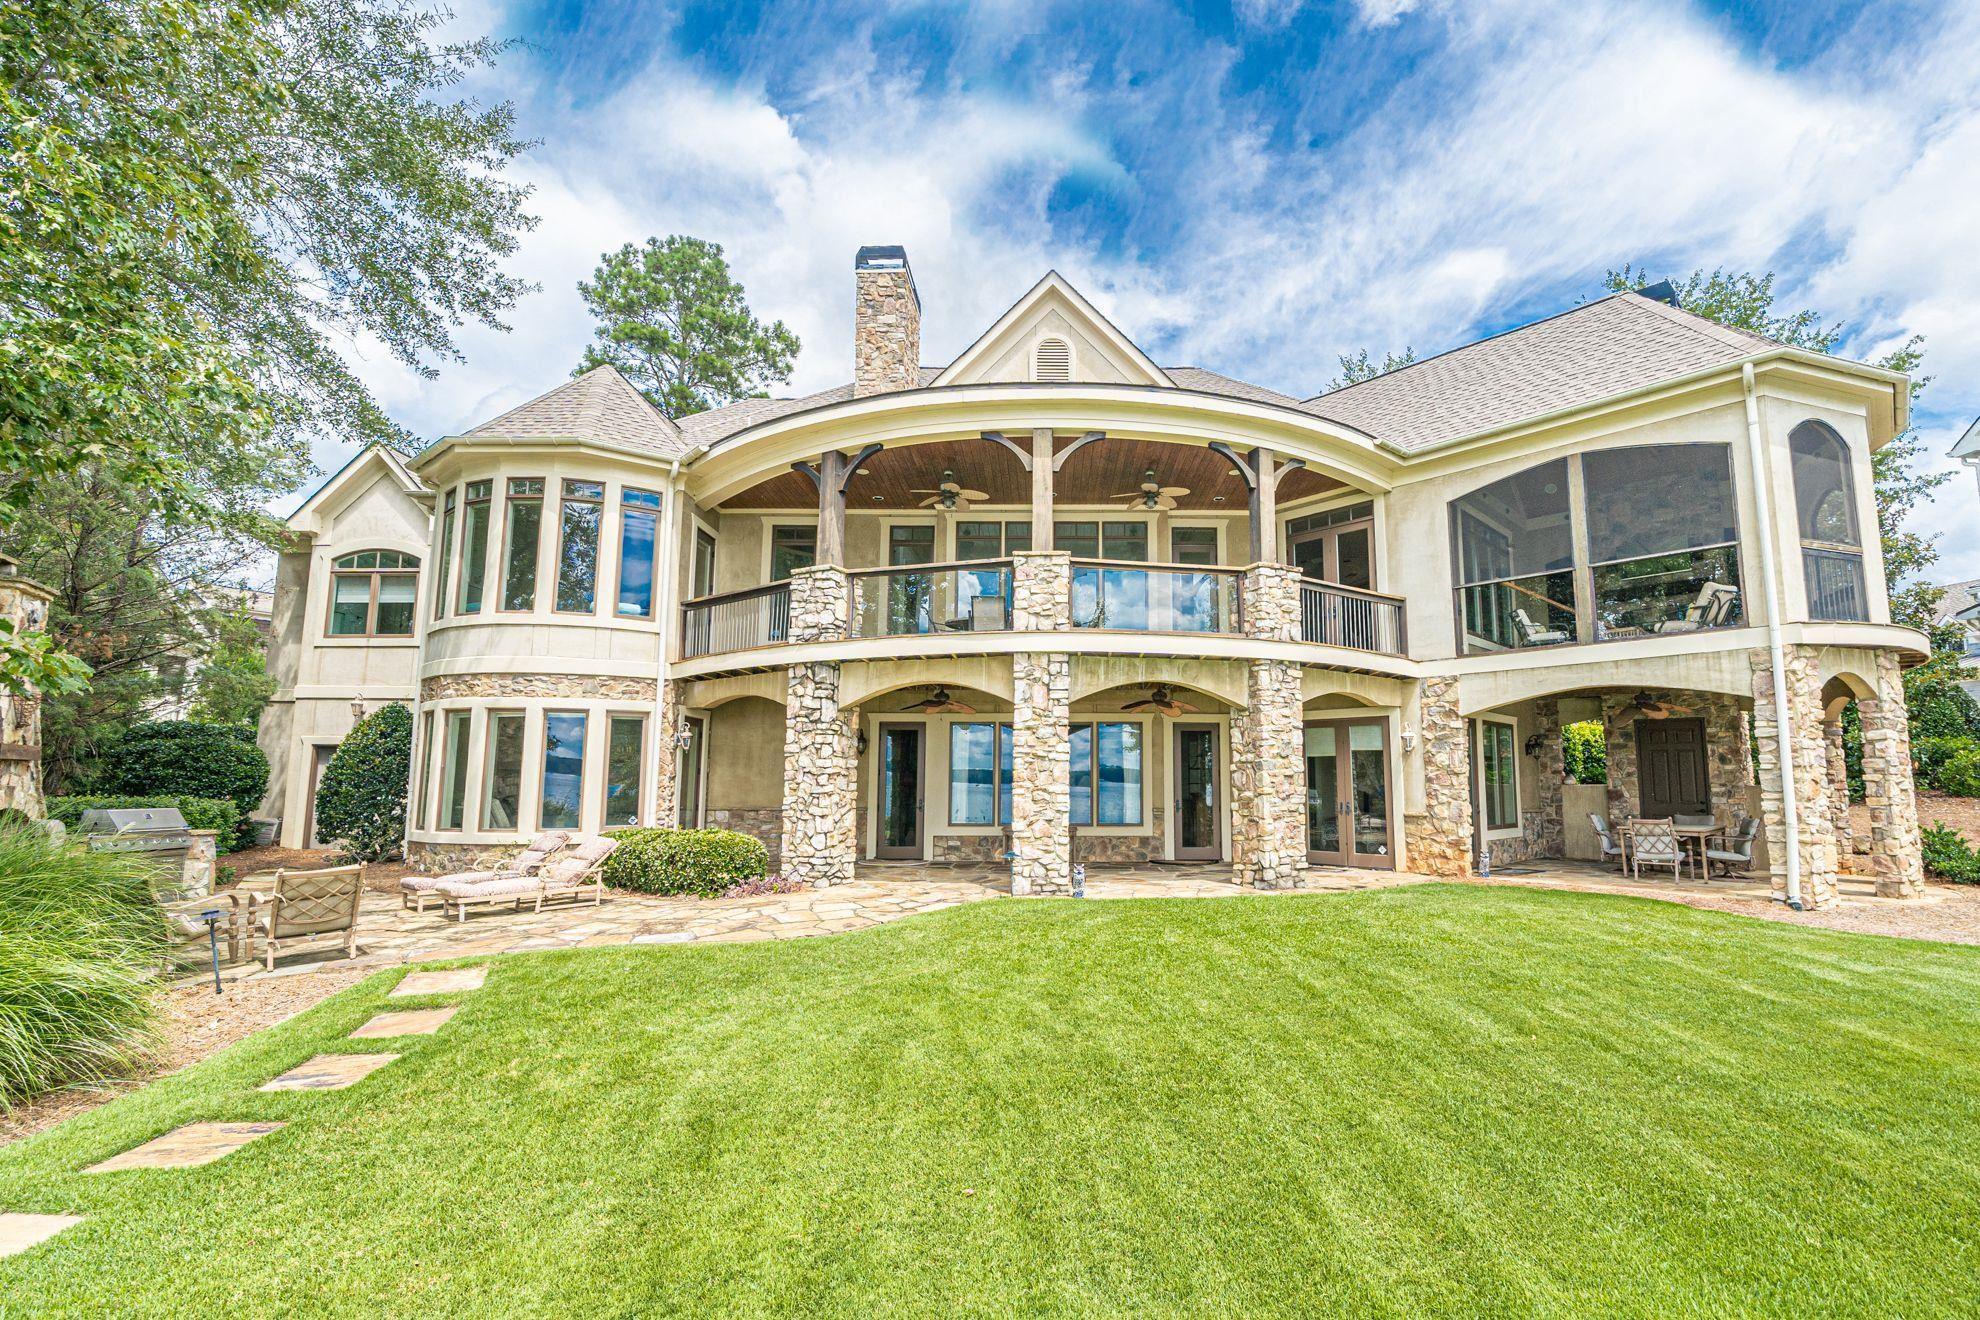 Property for sale at 132 HAWKS RIDGE, Eatonton,  Georgia 31024